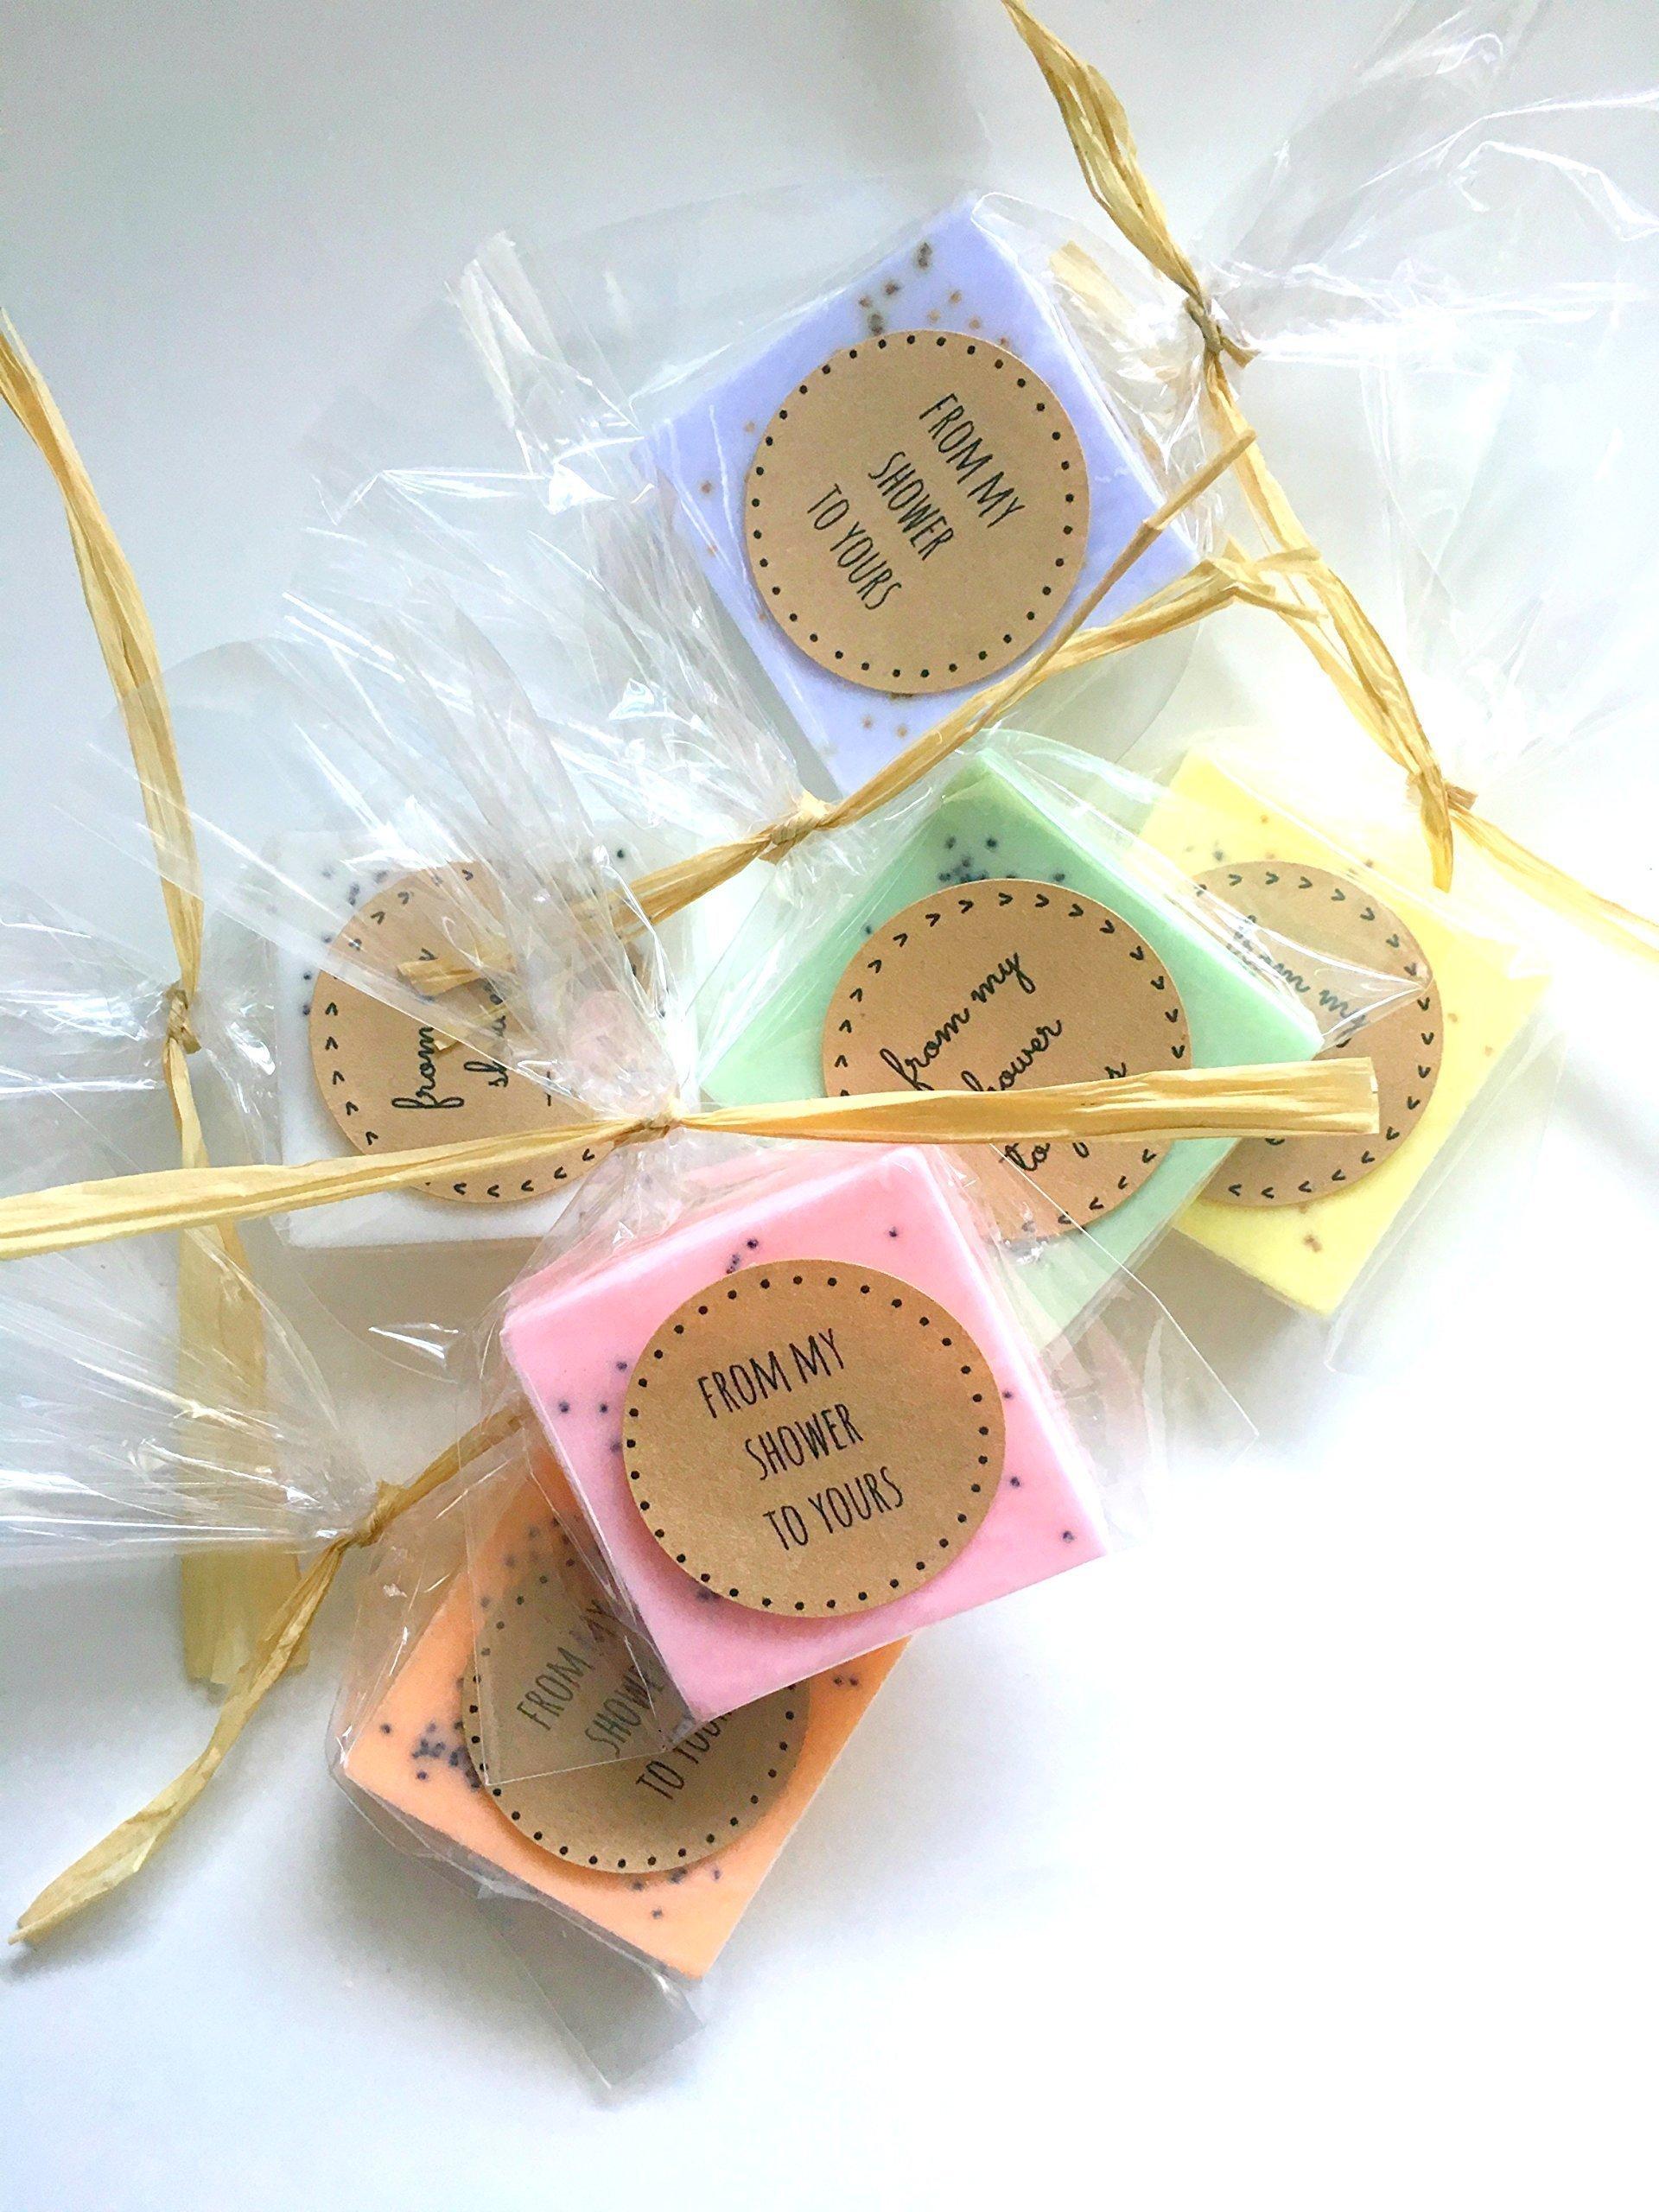 50 Wedding Favors: Soap Favors for Wedding Favors, Bridal Shower Favors, or Baby Shower Favors